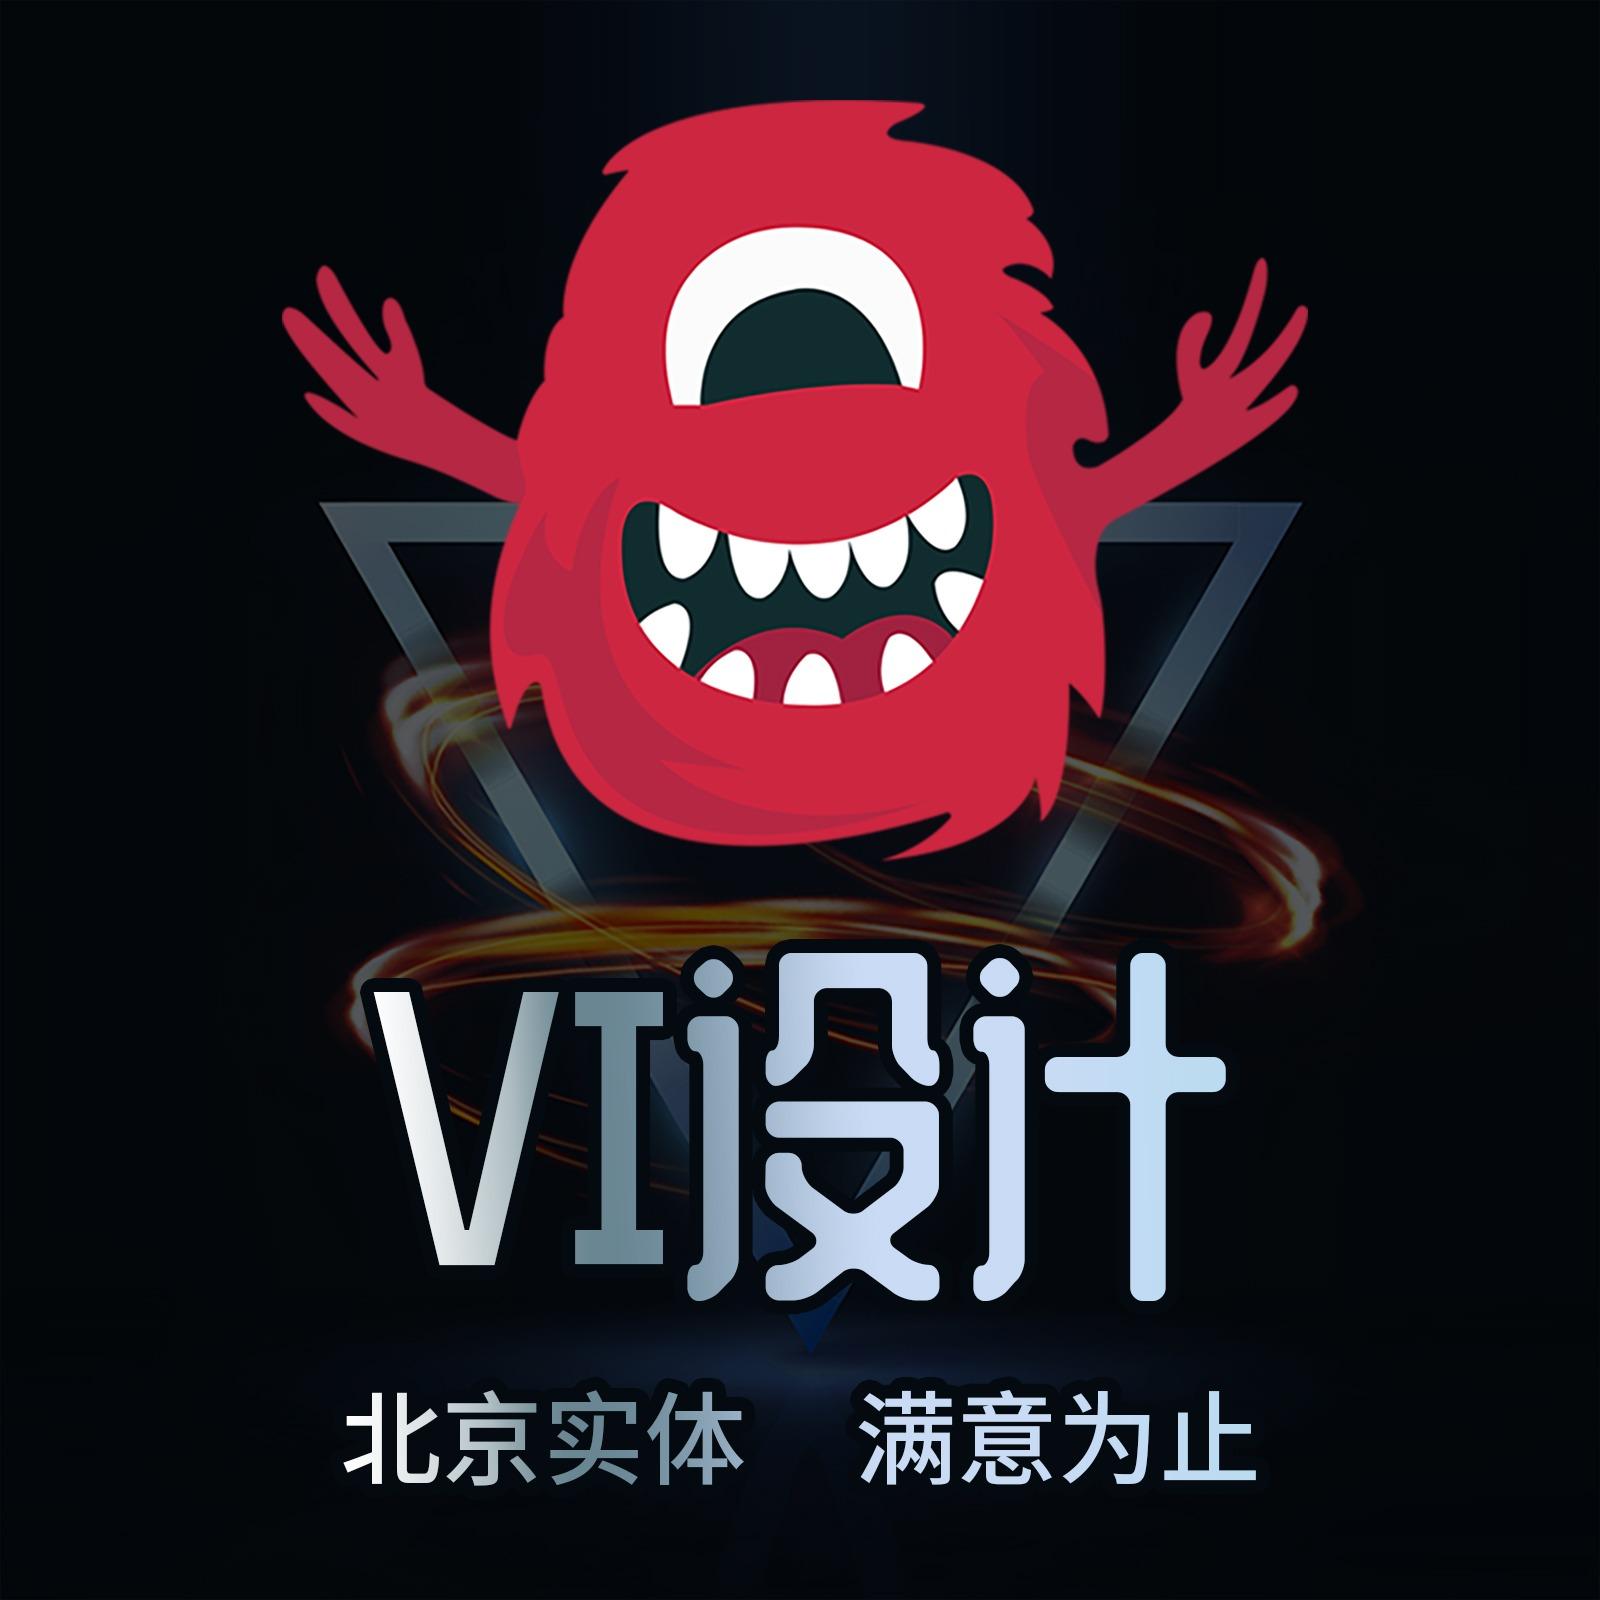 vi设计企业VIS全套VI设计品牌vi设计VIS视觉手册设